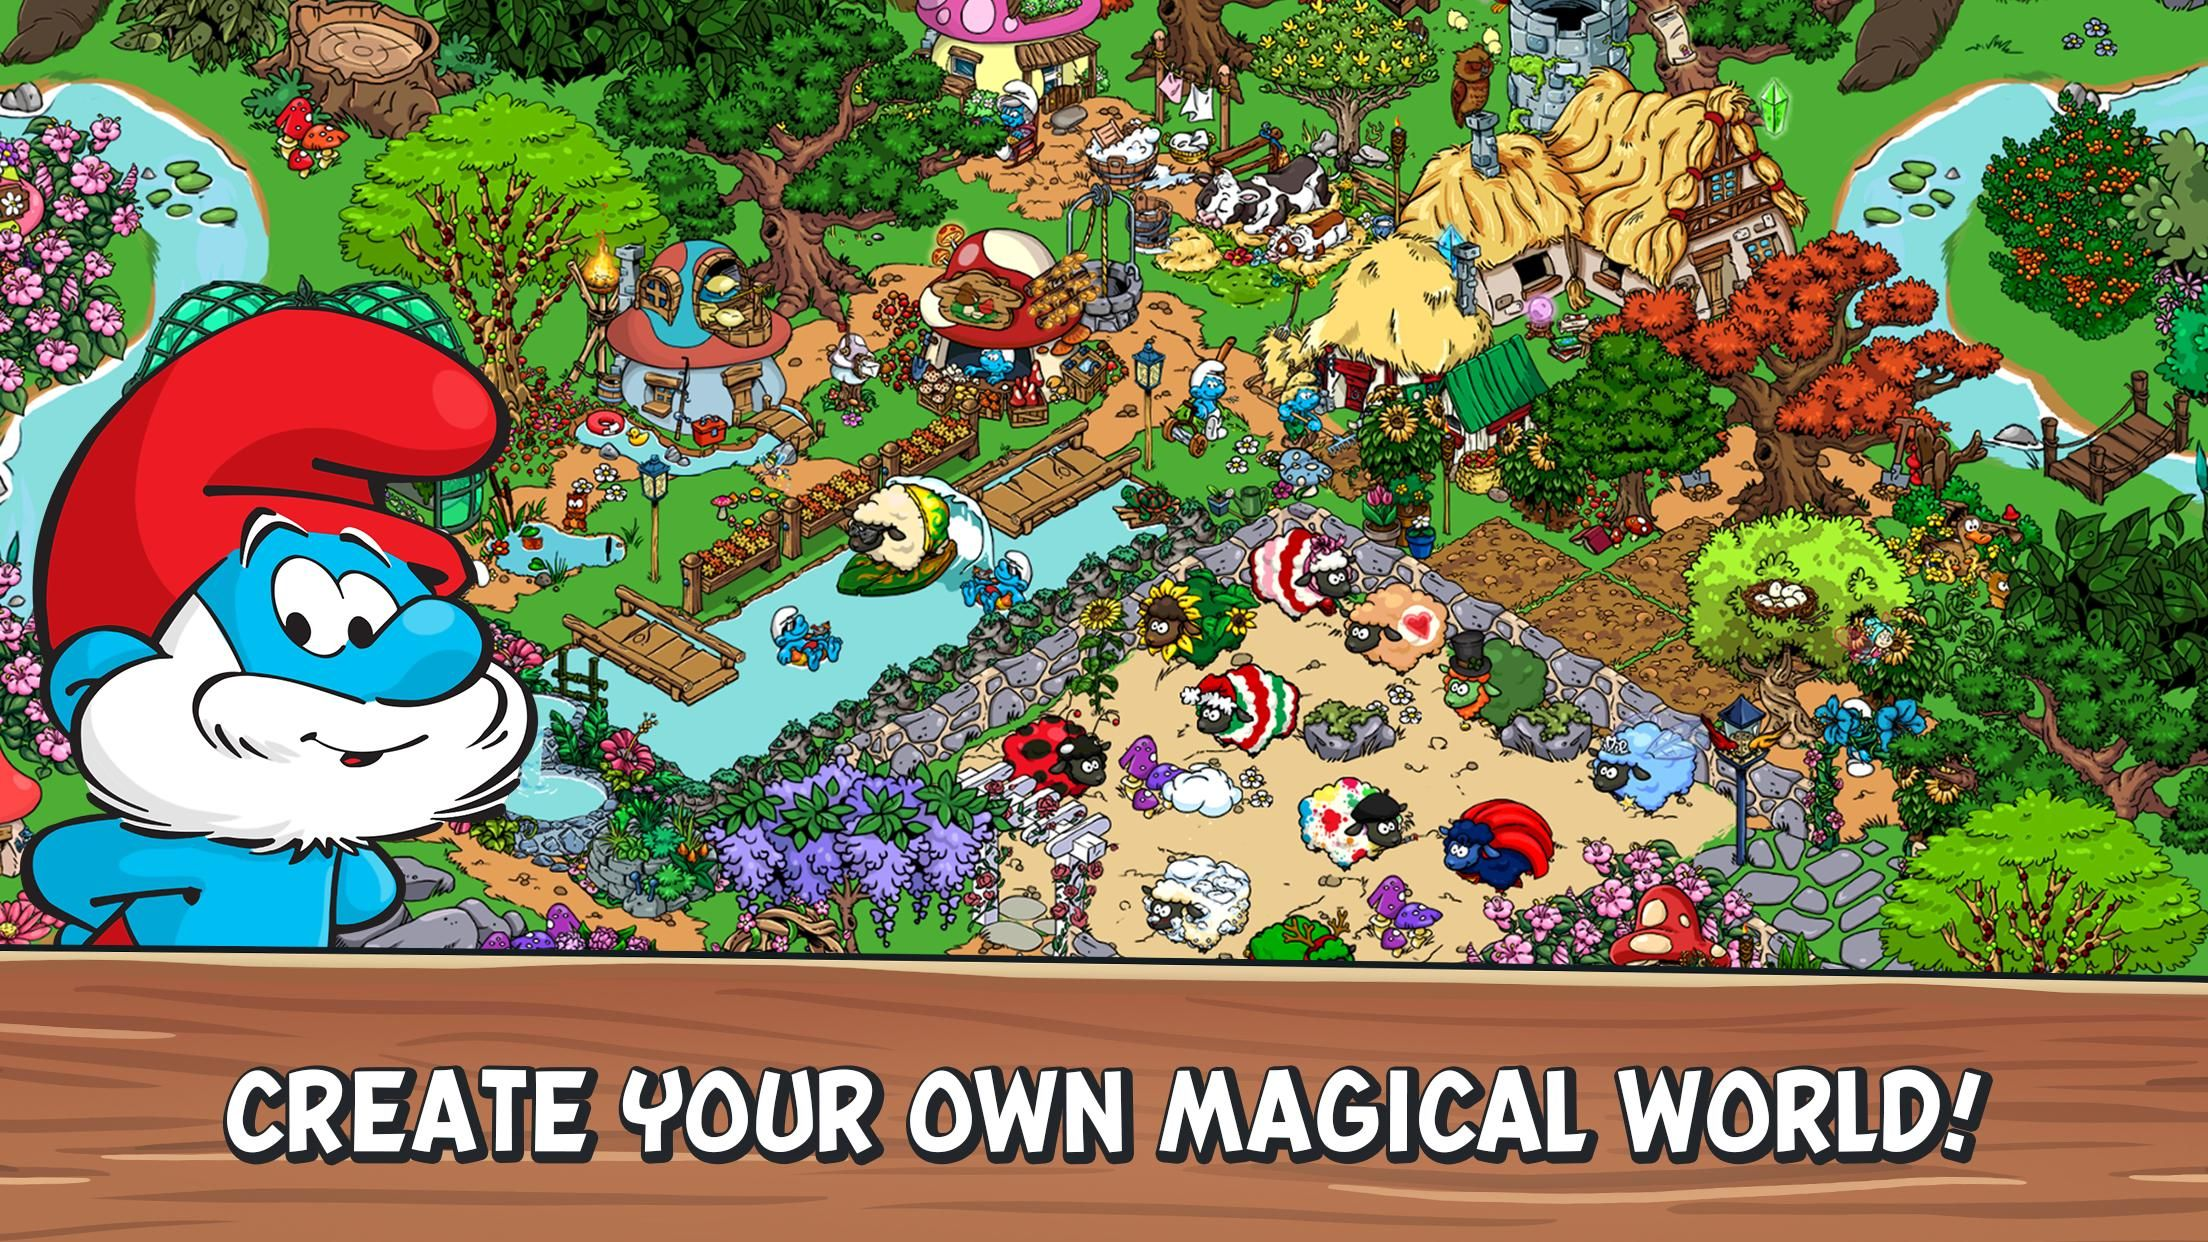 Smurfs Village Full Hileli Mod Apk Indir 8211 V1 98 1 Oyun Hile Isletim Sistemi